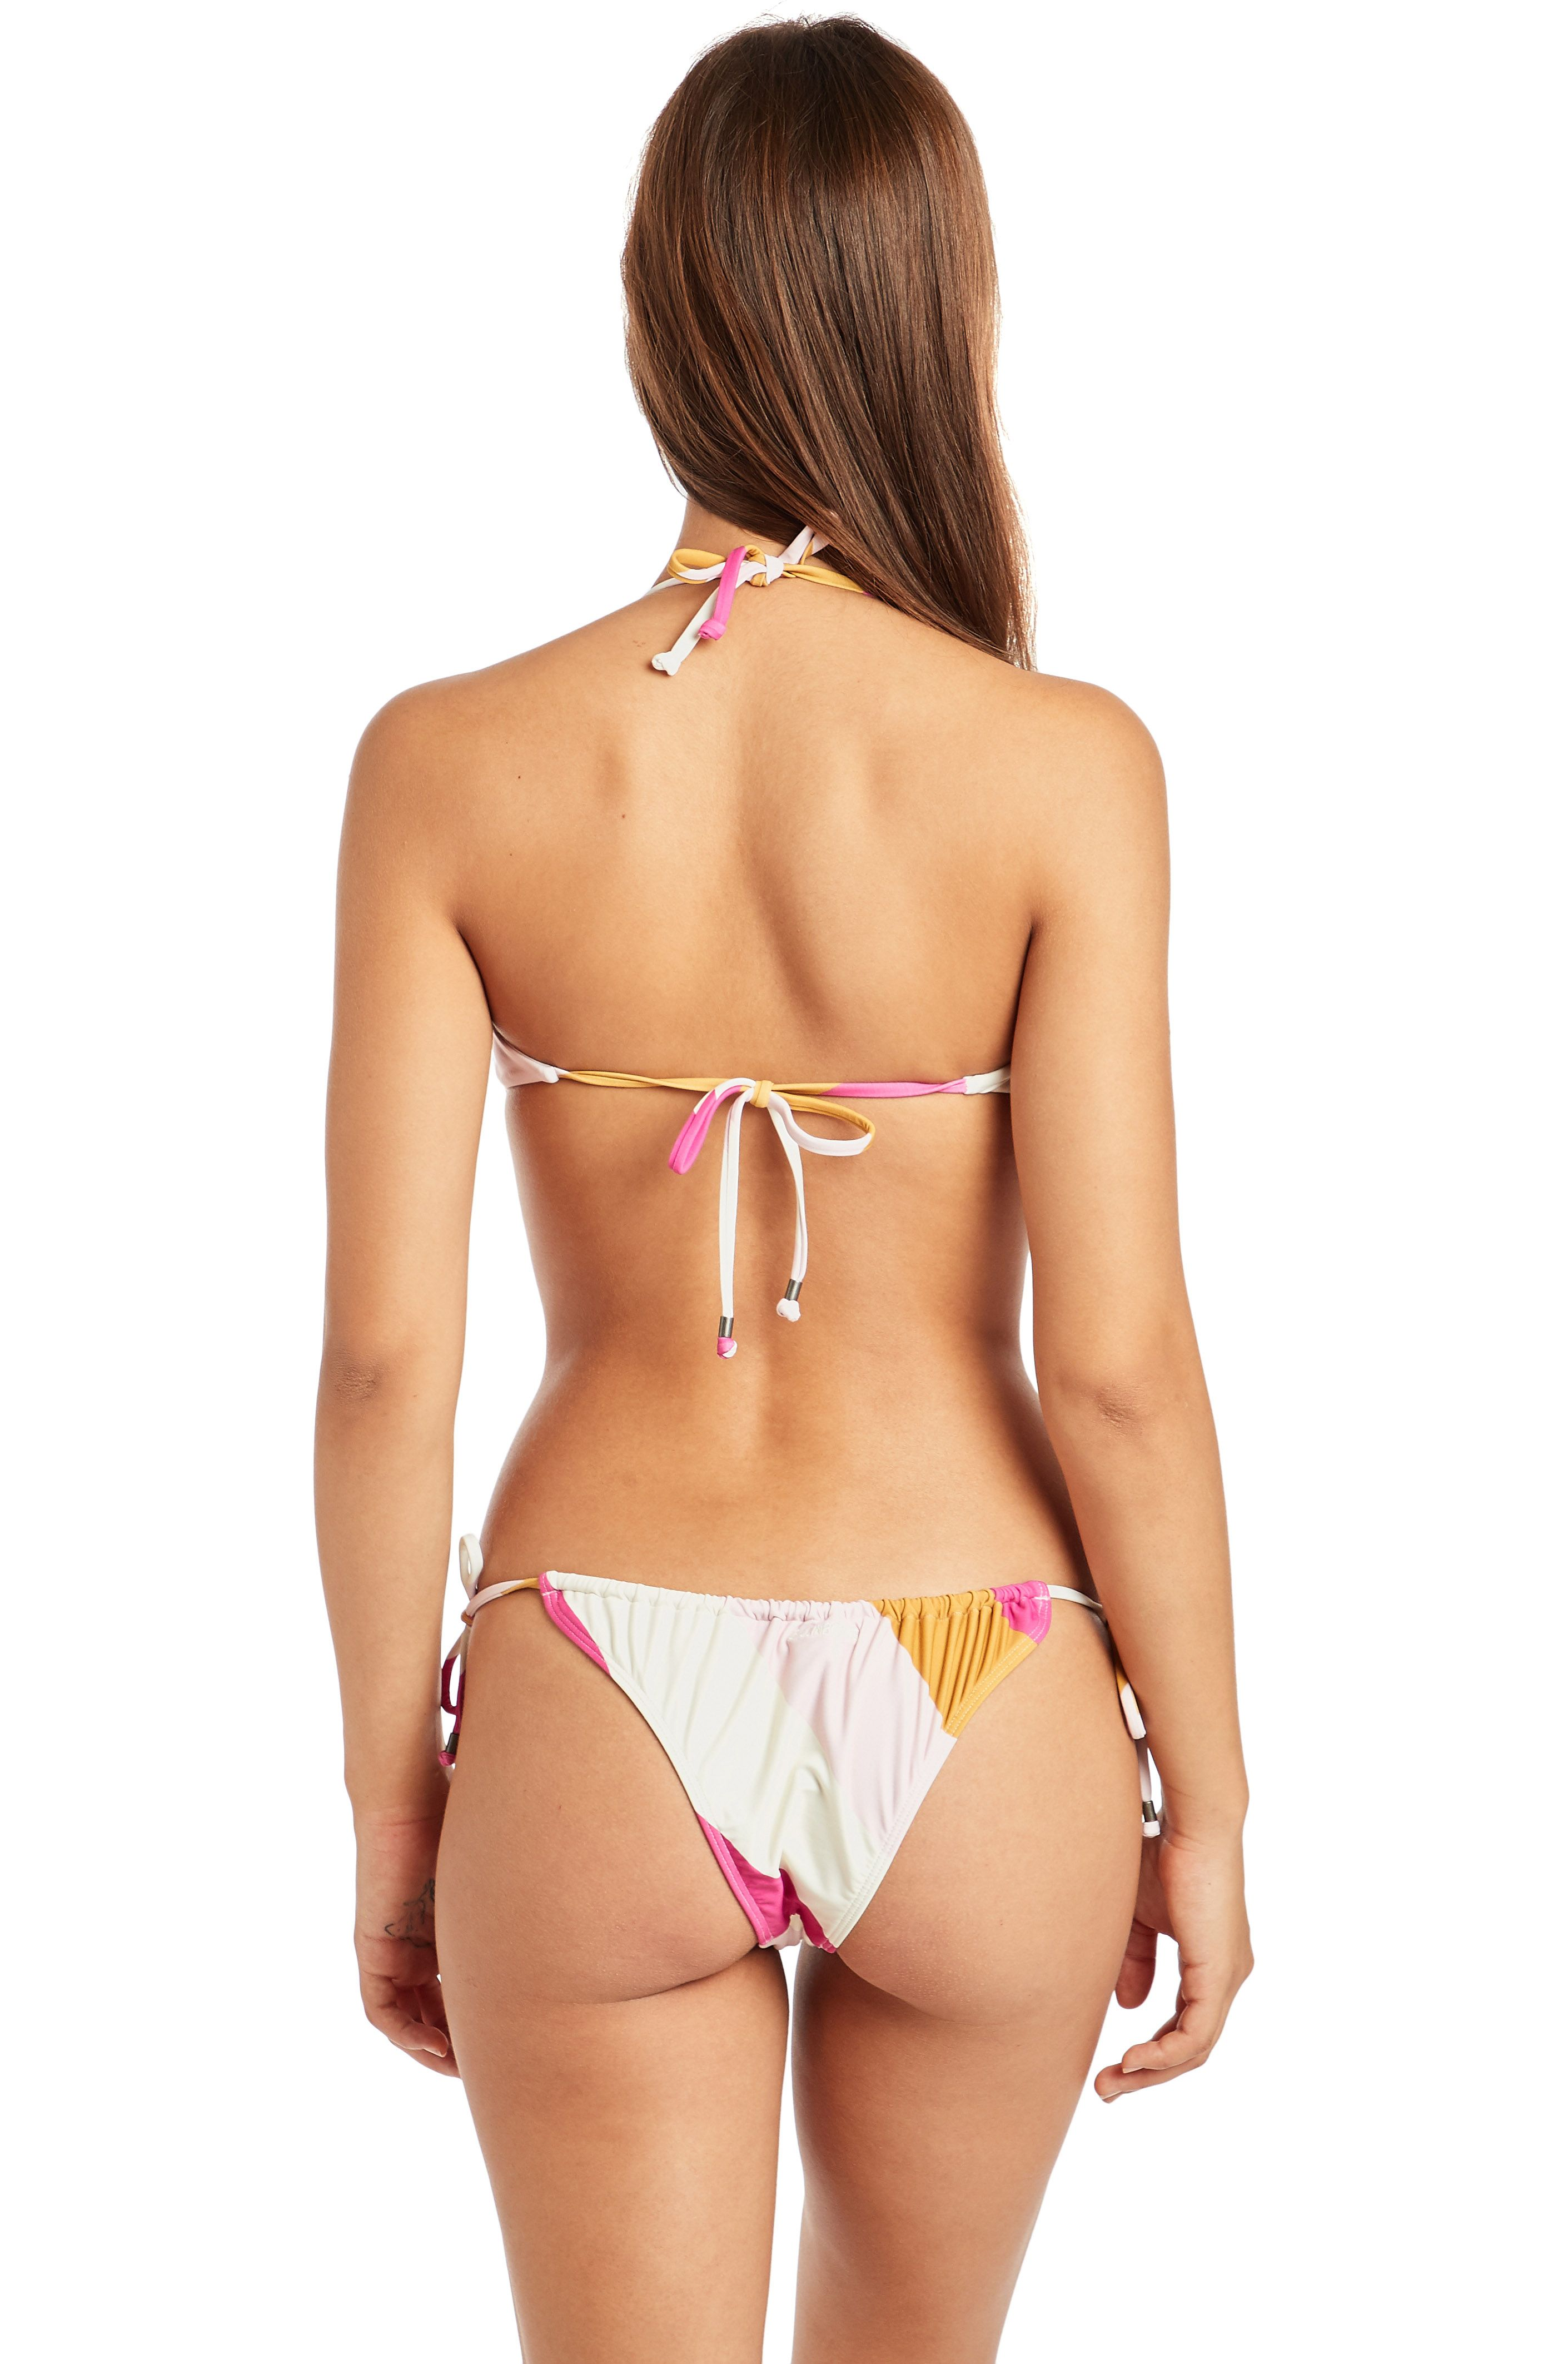 Bikini Top Billabong SOUL STRIPE BANDEAU COSTA DEL SOL Multi